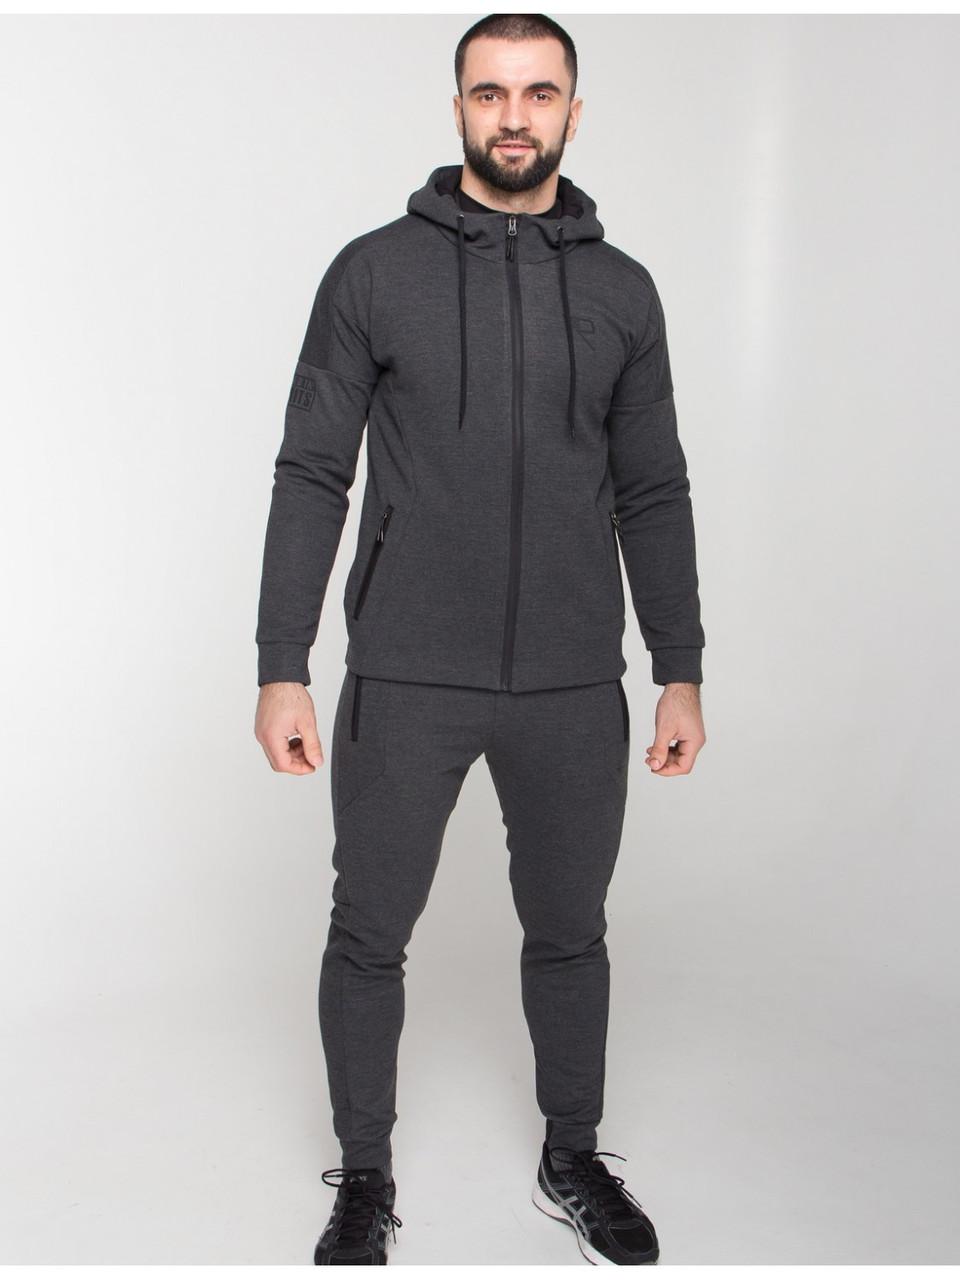 Спортивный костюм Riccardo КМ-AD-2 Антрацит